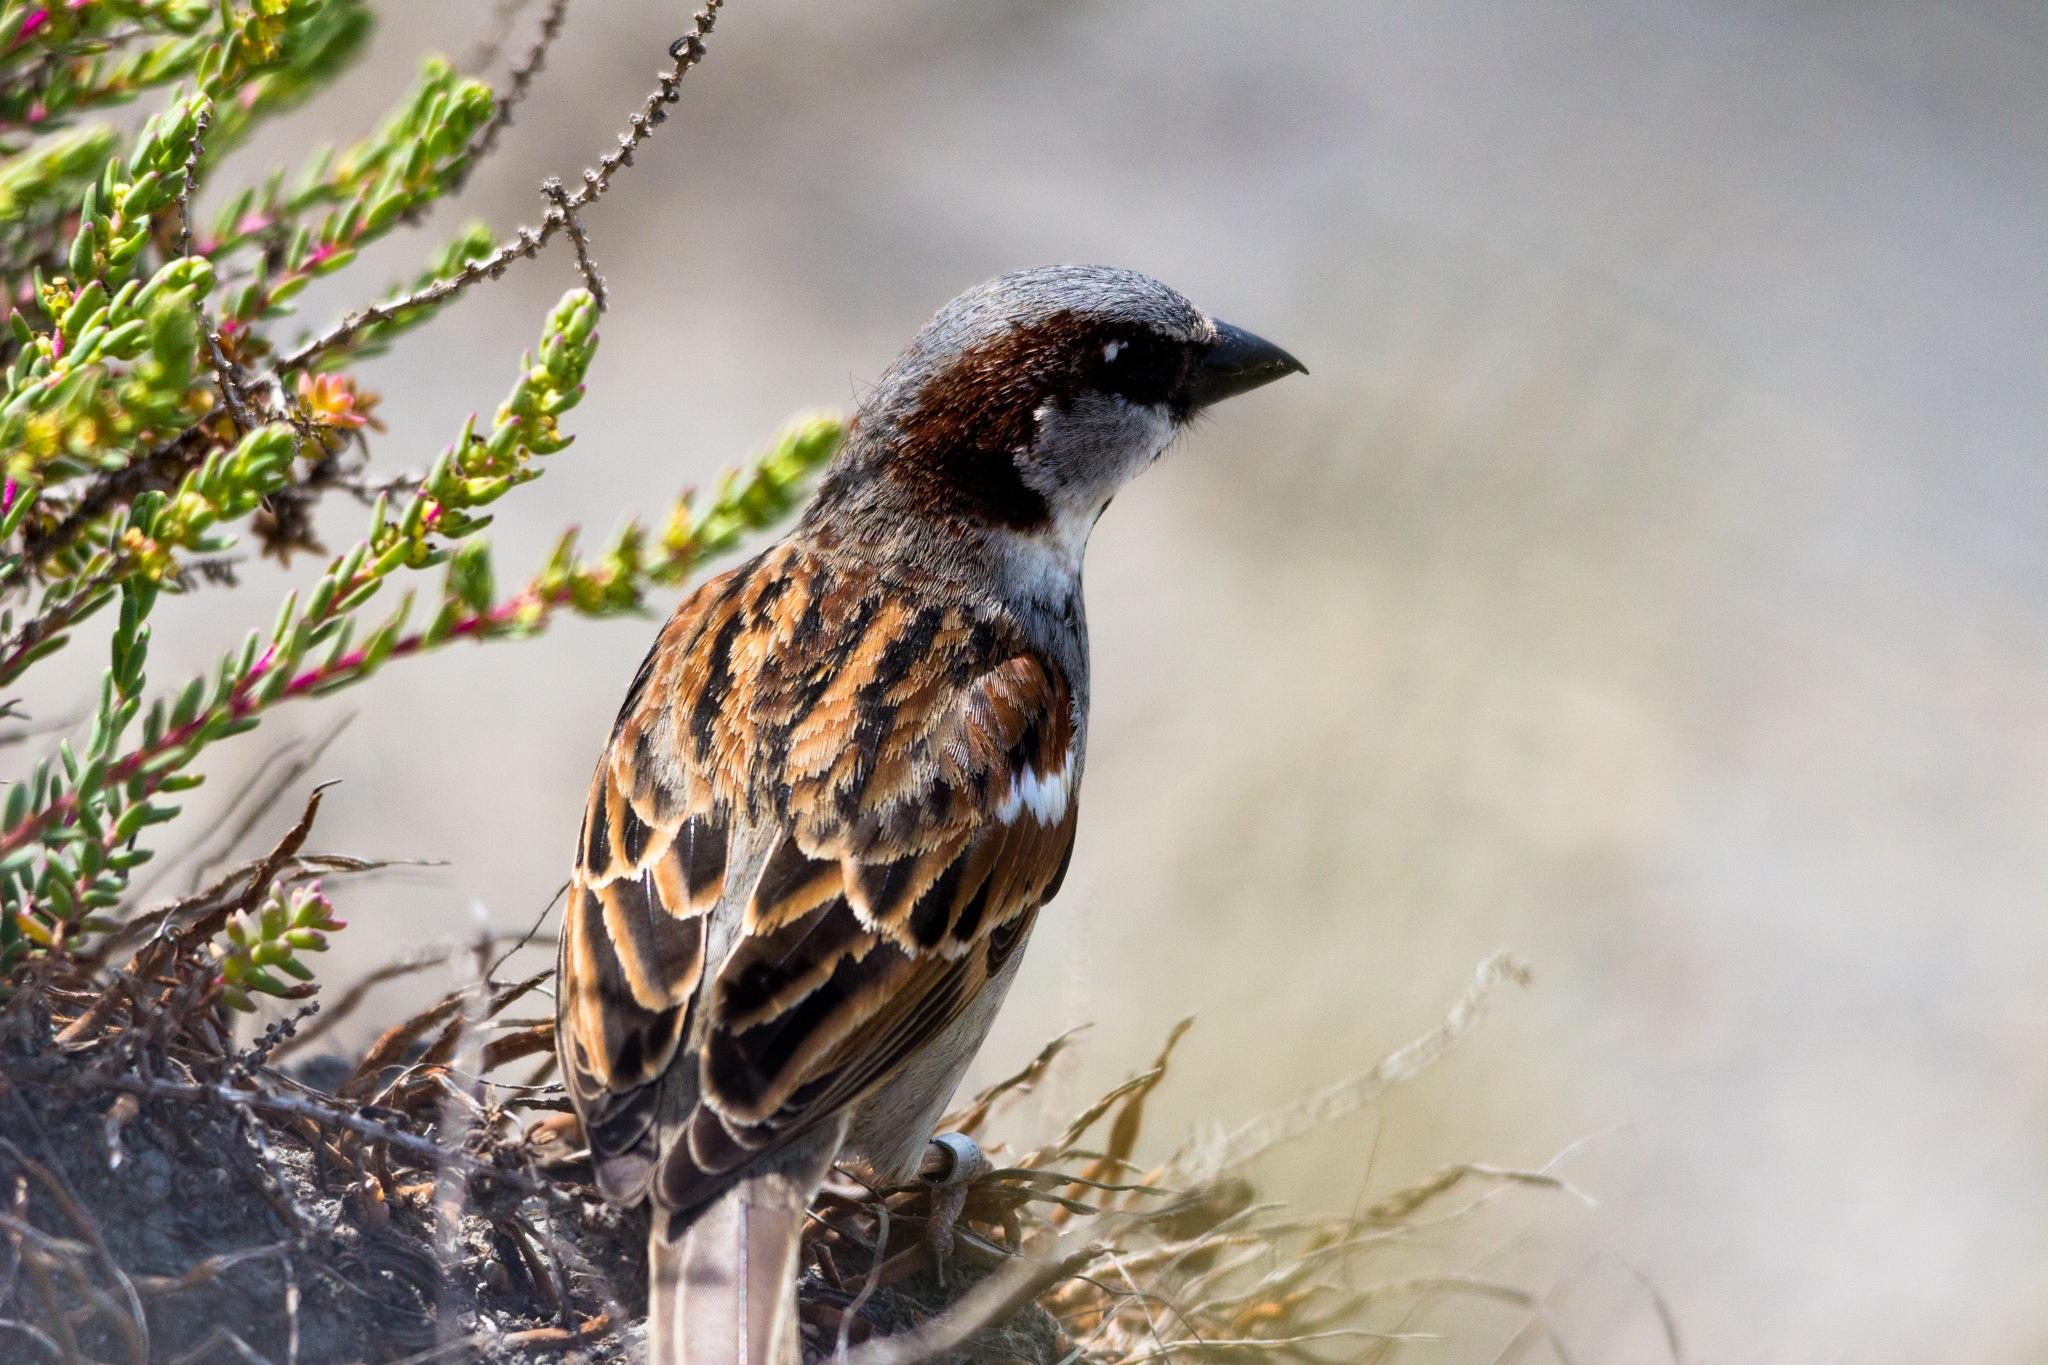 House sparrow (male) by Andrea Prestileo